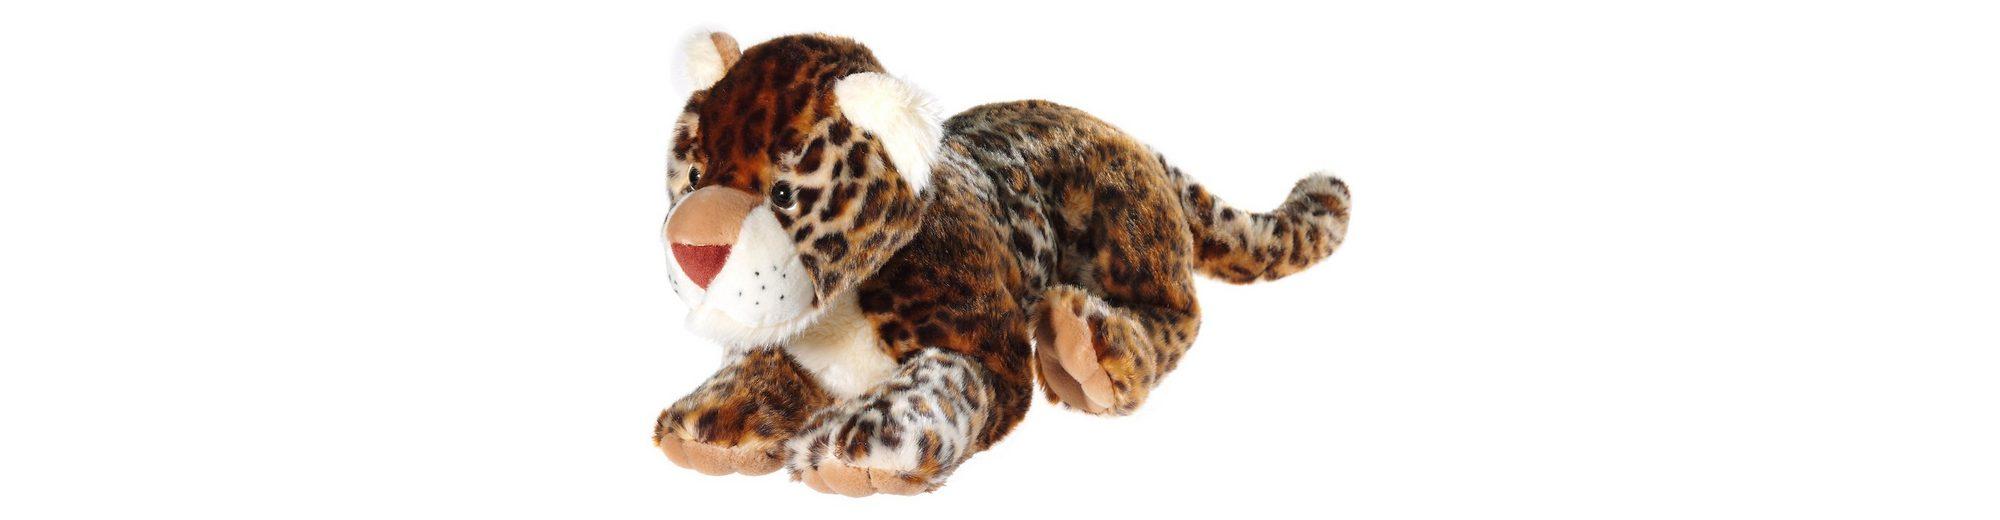 Heunec Plüschtier »Natureline Softissimo Leopard«